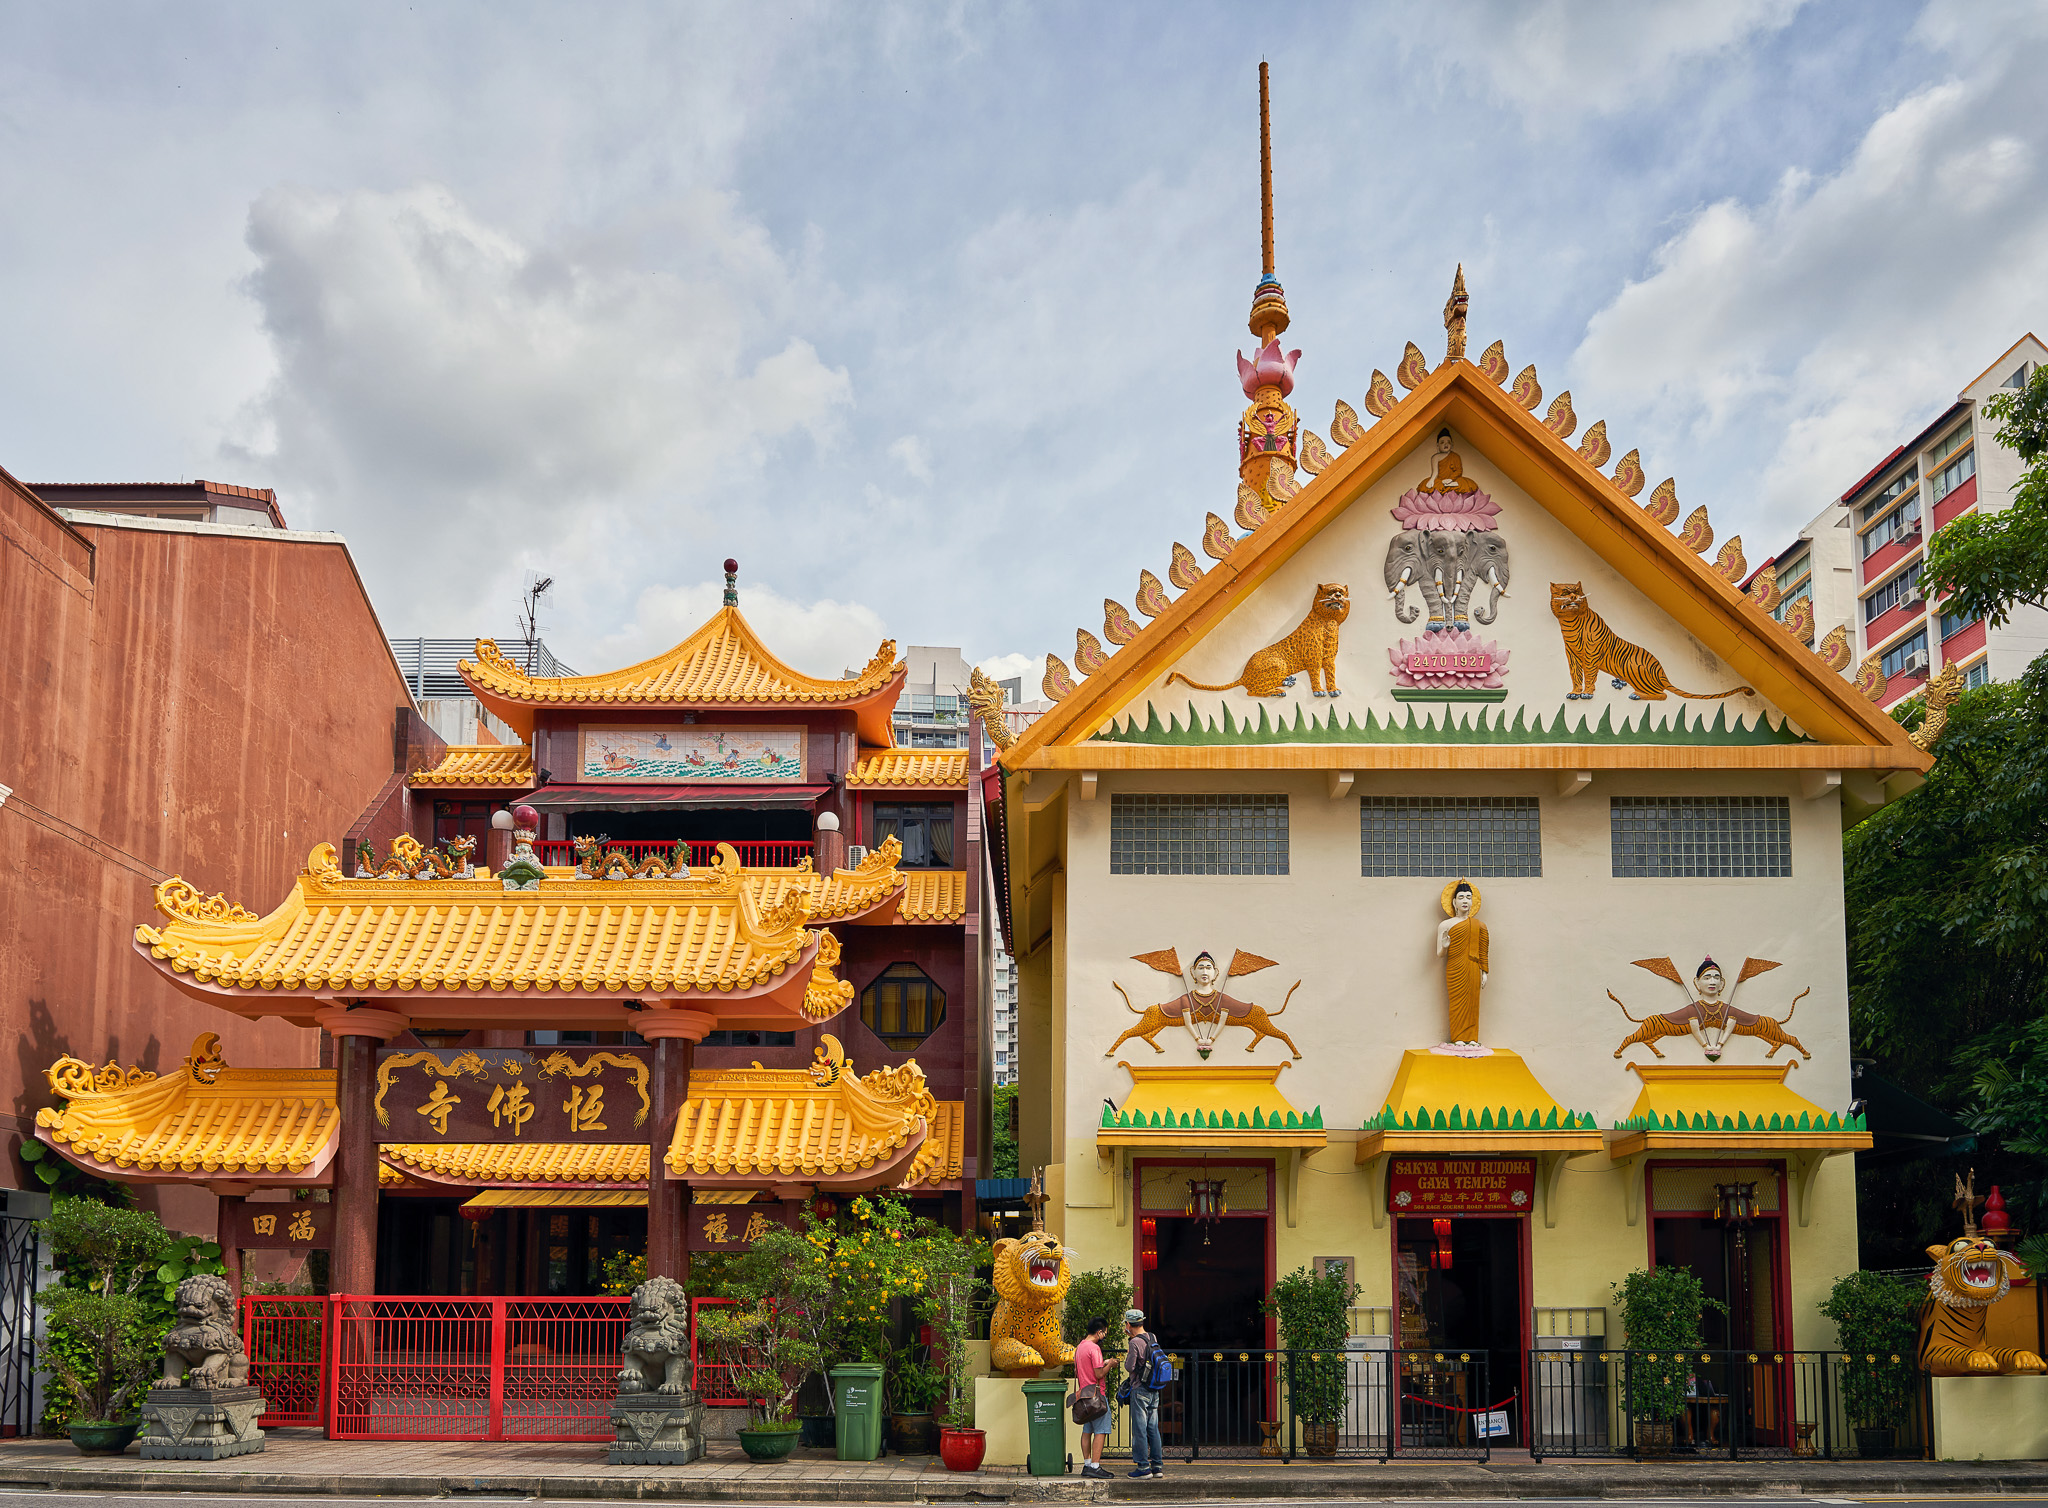 Sakya Muni Buddha Gaya Temple at the Race Course Road, Singapore